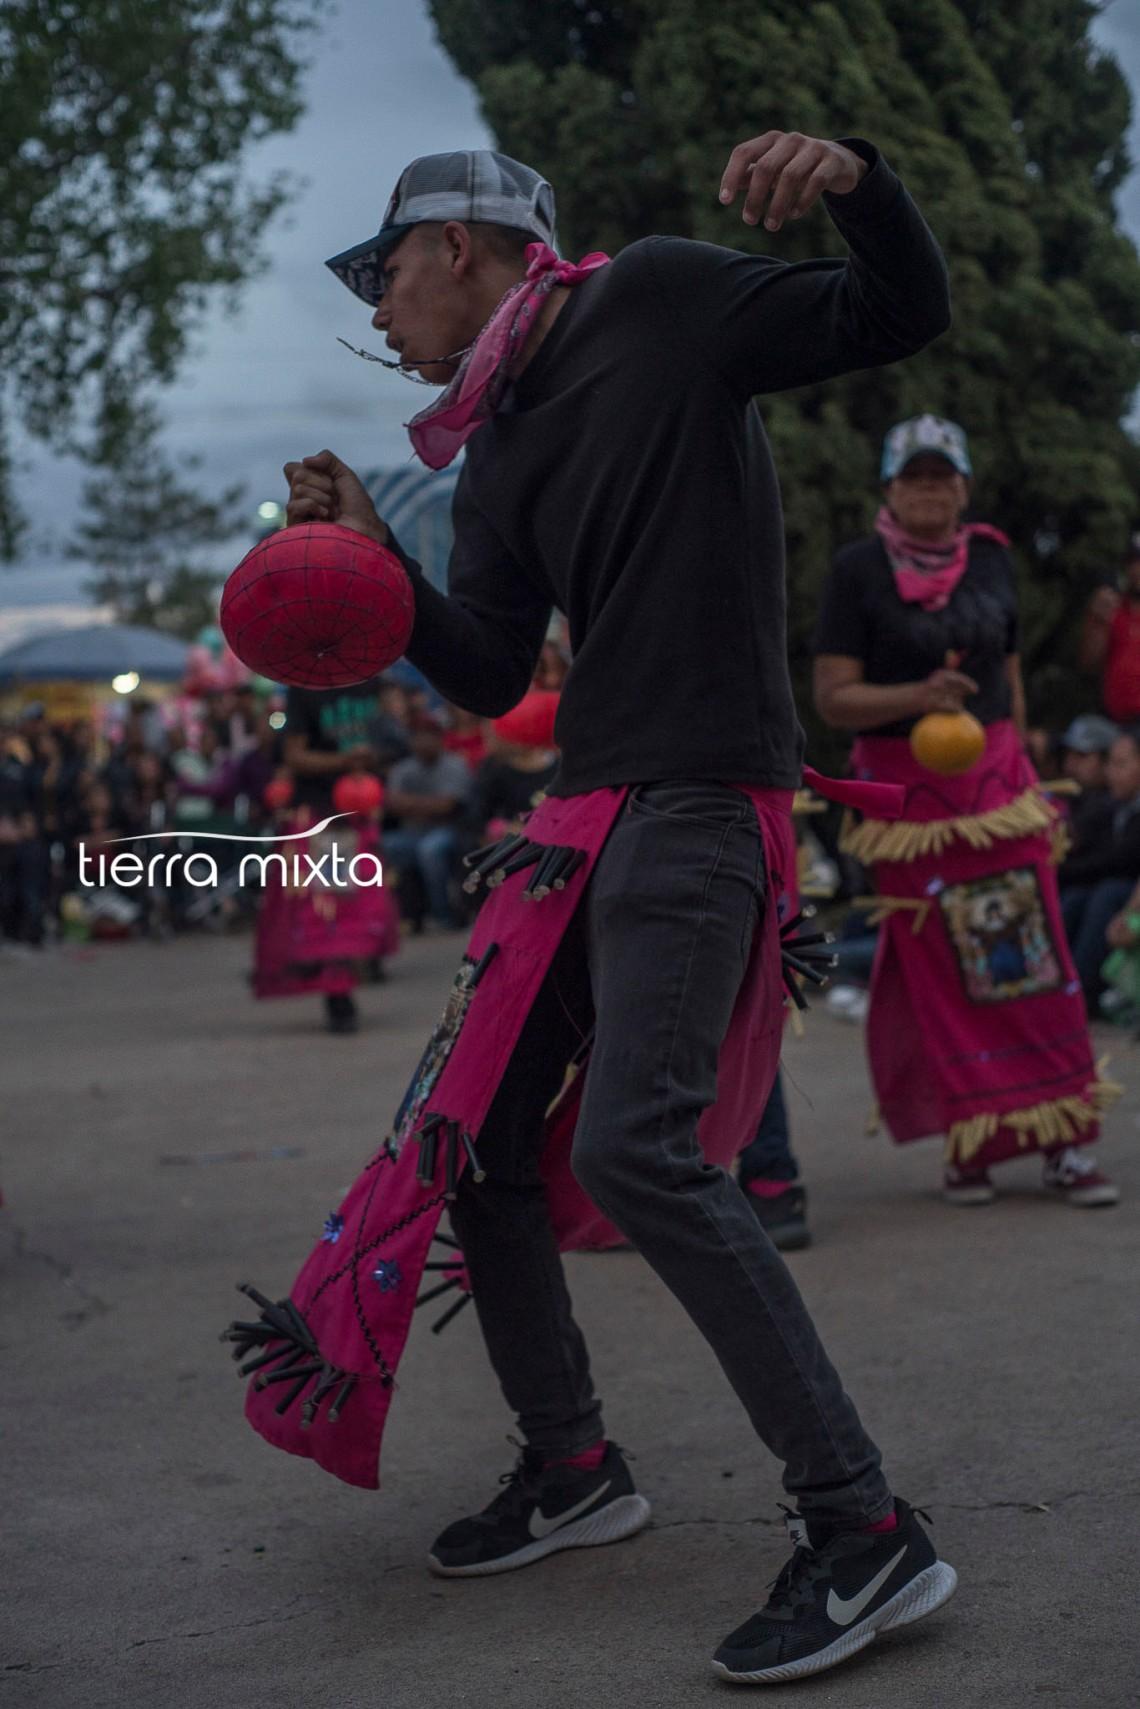 La Sauceda_Tierra Mixta_Cristian Herrera_2020__8